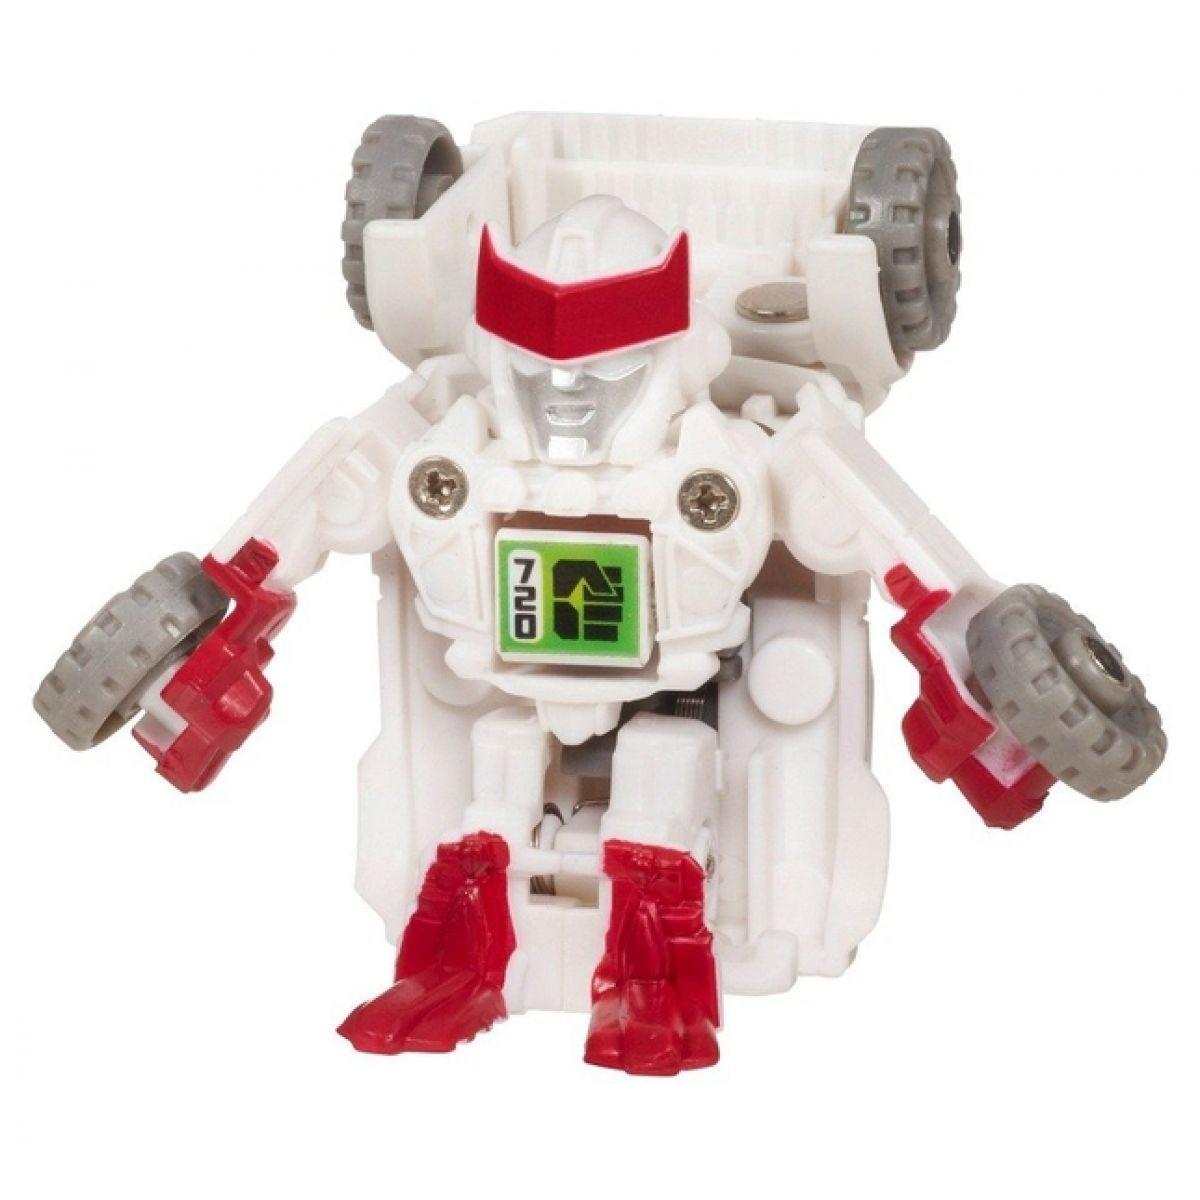 Transformers BOT SHOTS Hasbro - B006 Autobot Rachet